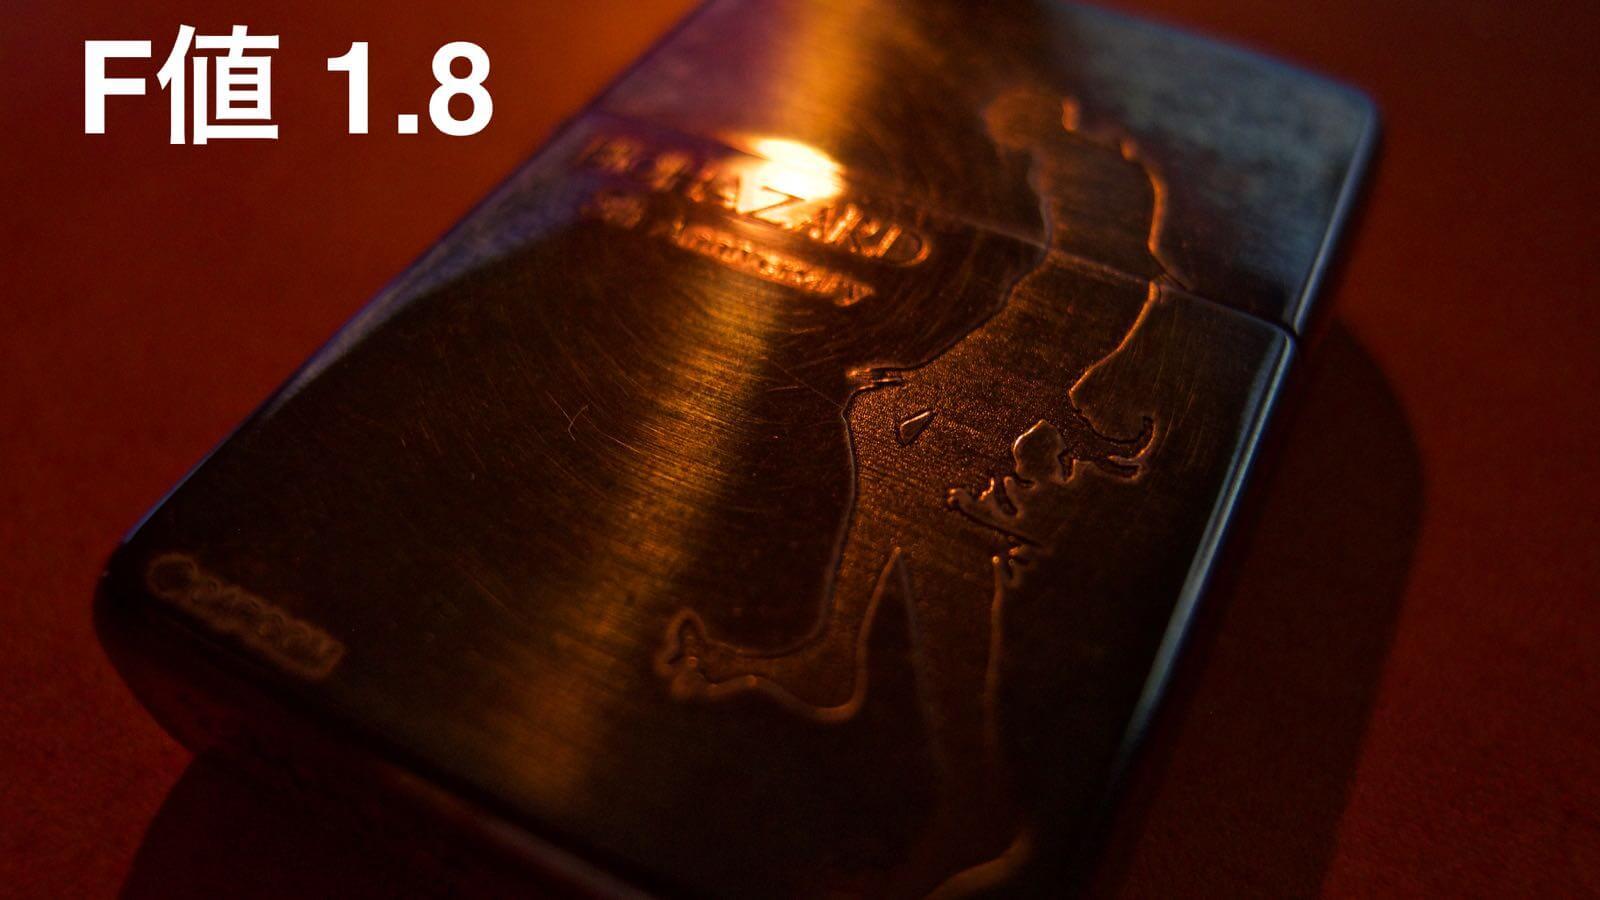 0064 Olympus XZ 1 Review 03